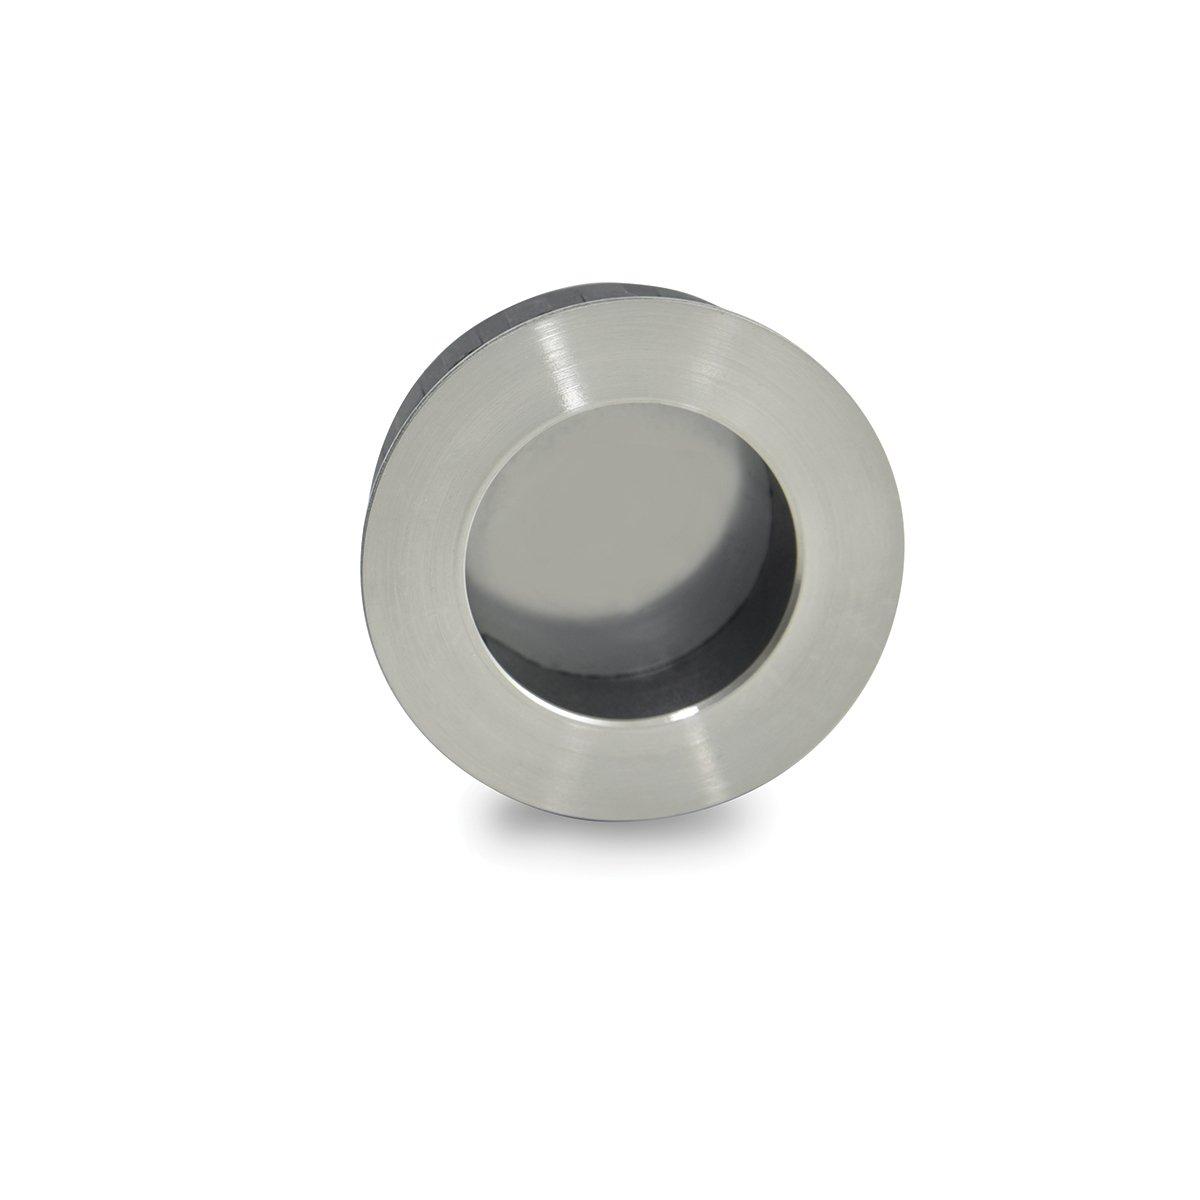 Jako WFH111X50 Round Flush Pull - Stainless Steel, Diameter 2''